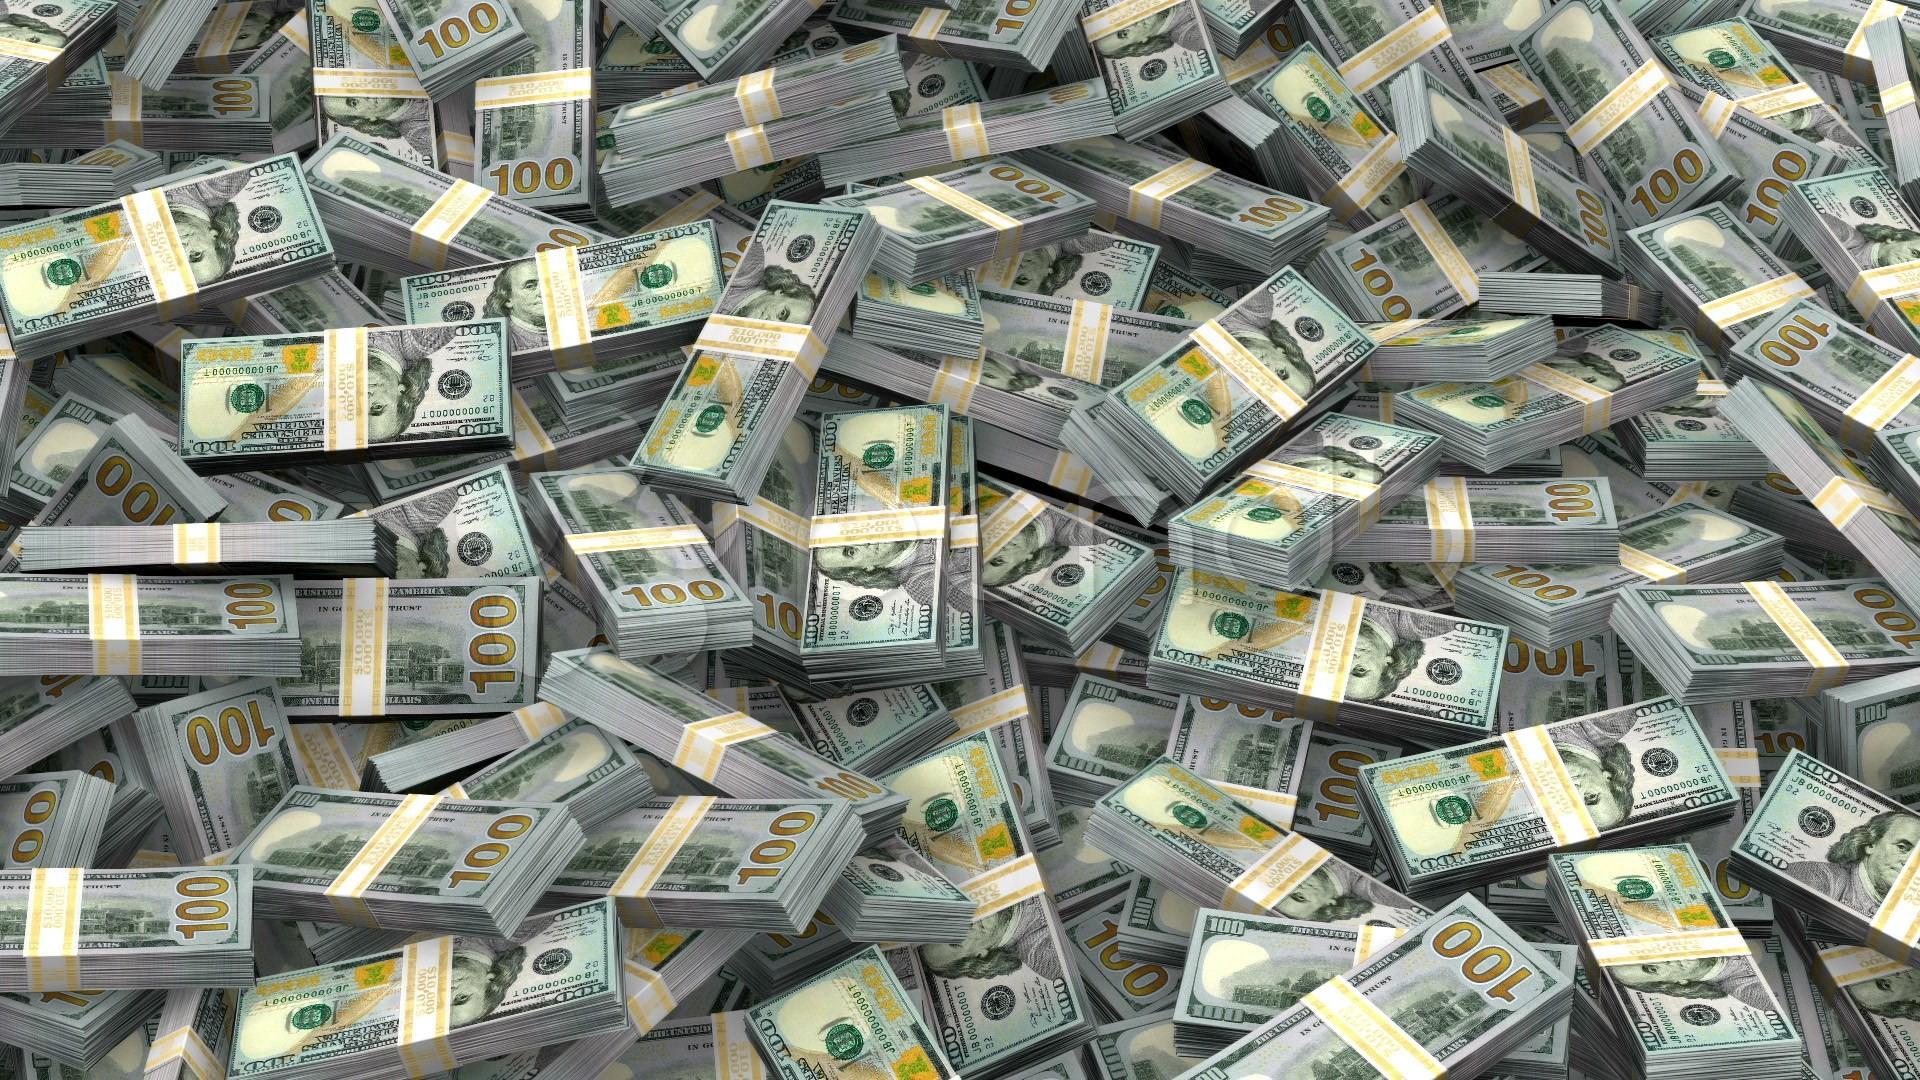 … Great Hd Phone Wallpapers 100 Dollar Bill Wallpaper in 100 Dollar Bill  Wallpaper WallpaperSafari 4K Pictures